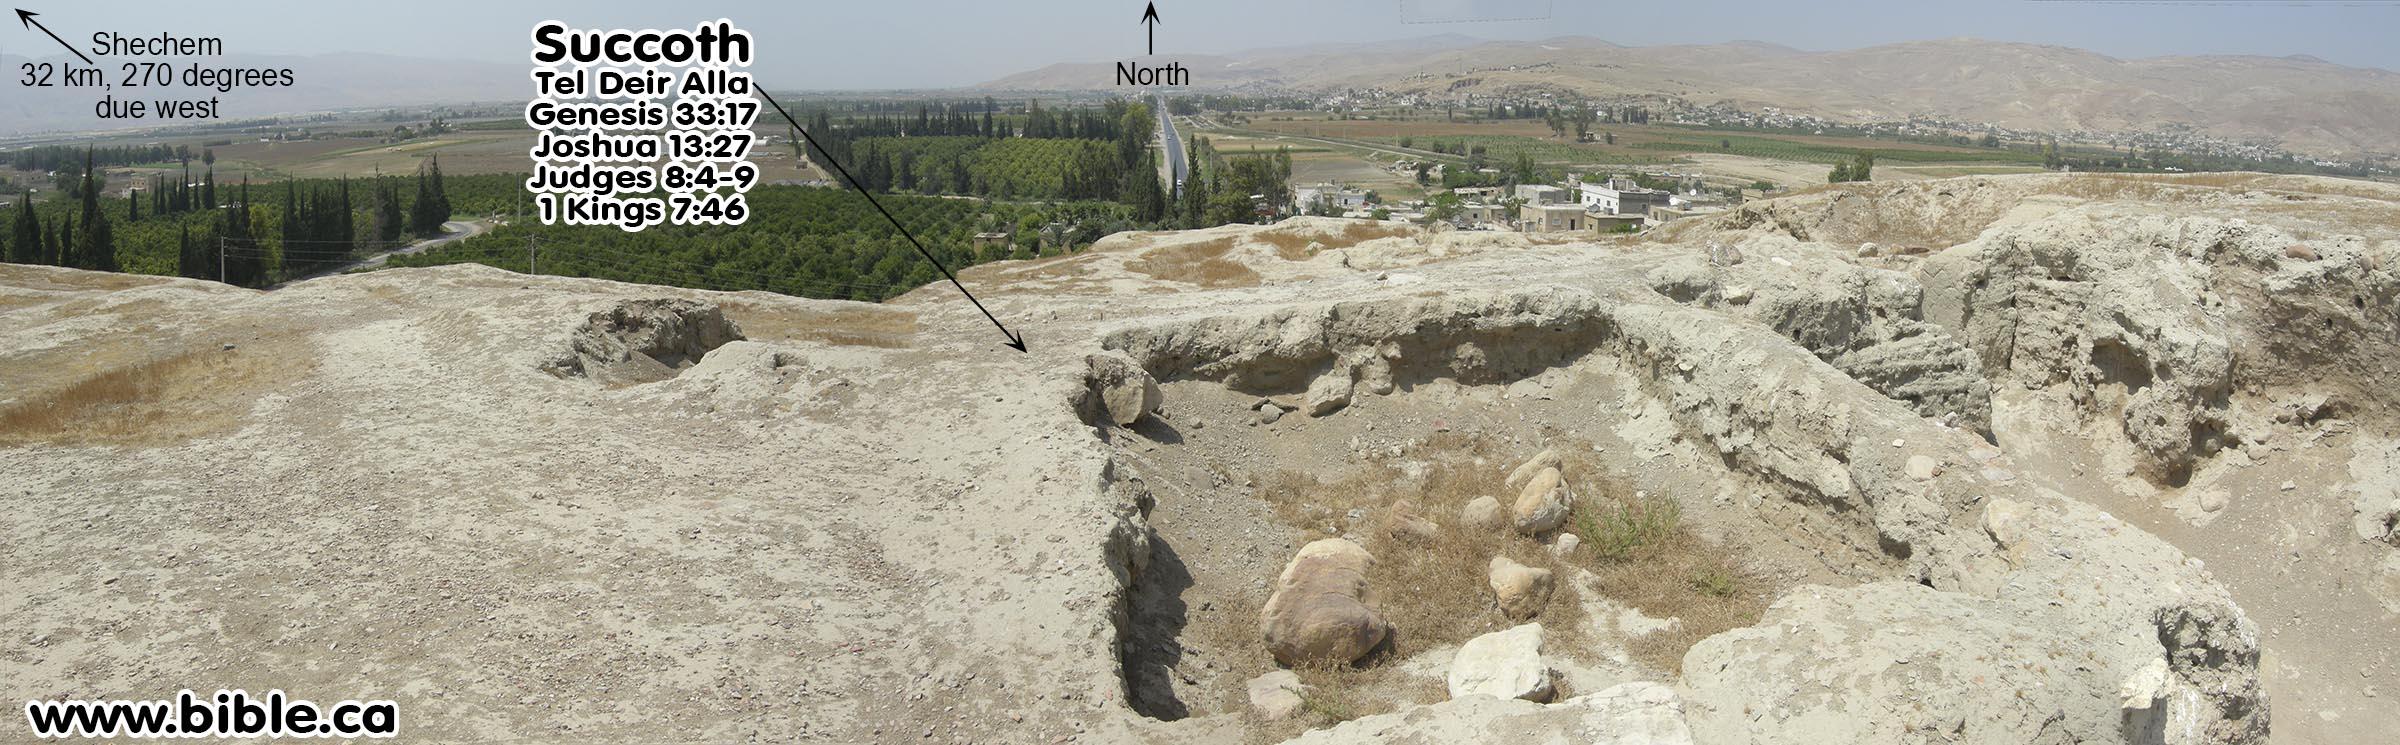 http://www.bible.ca/archeology/panorama-israel-archeology-succoth-deir-alla-balaam-th.jpg